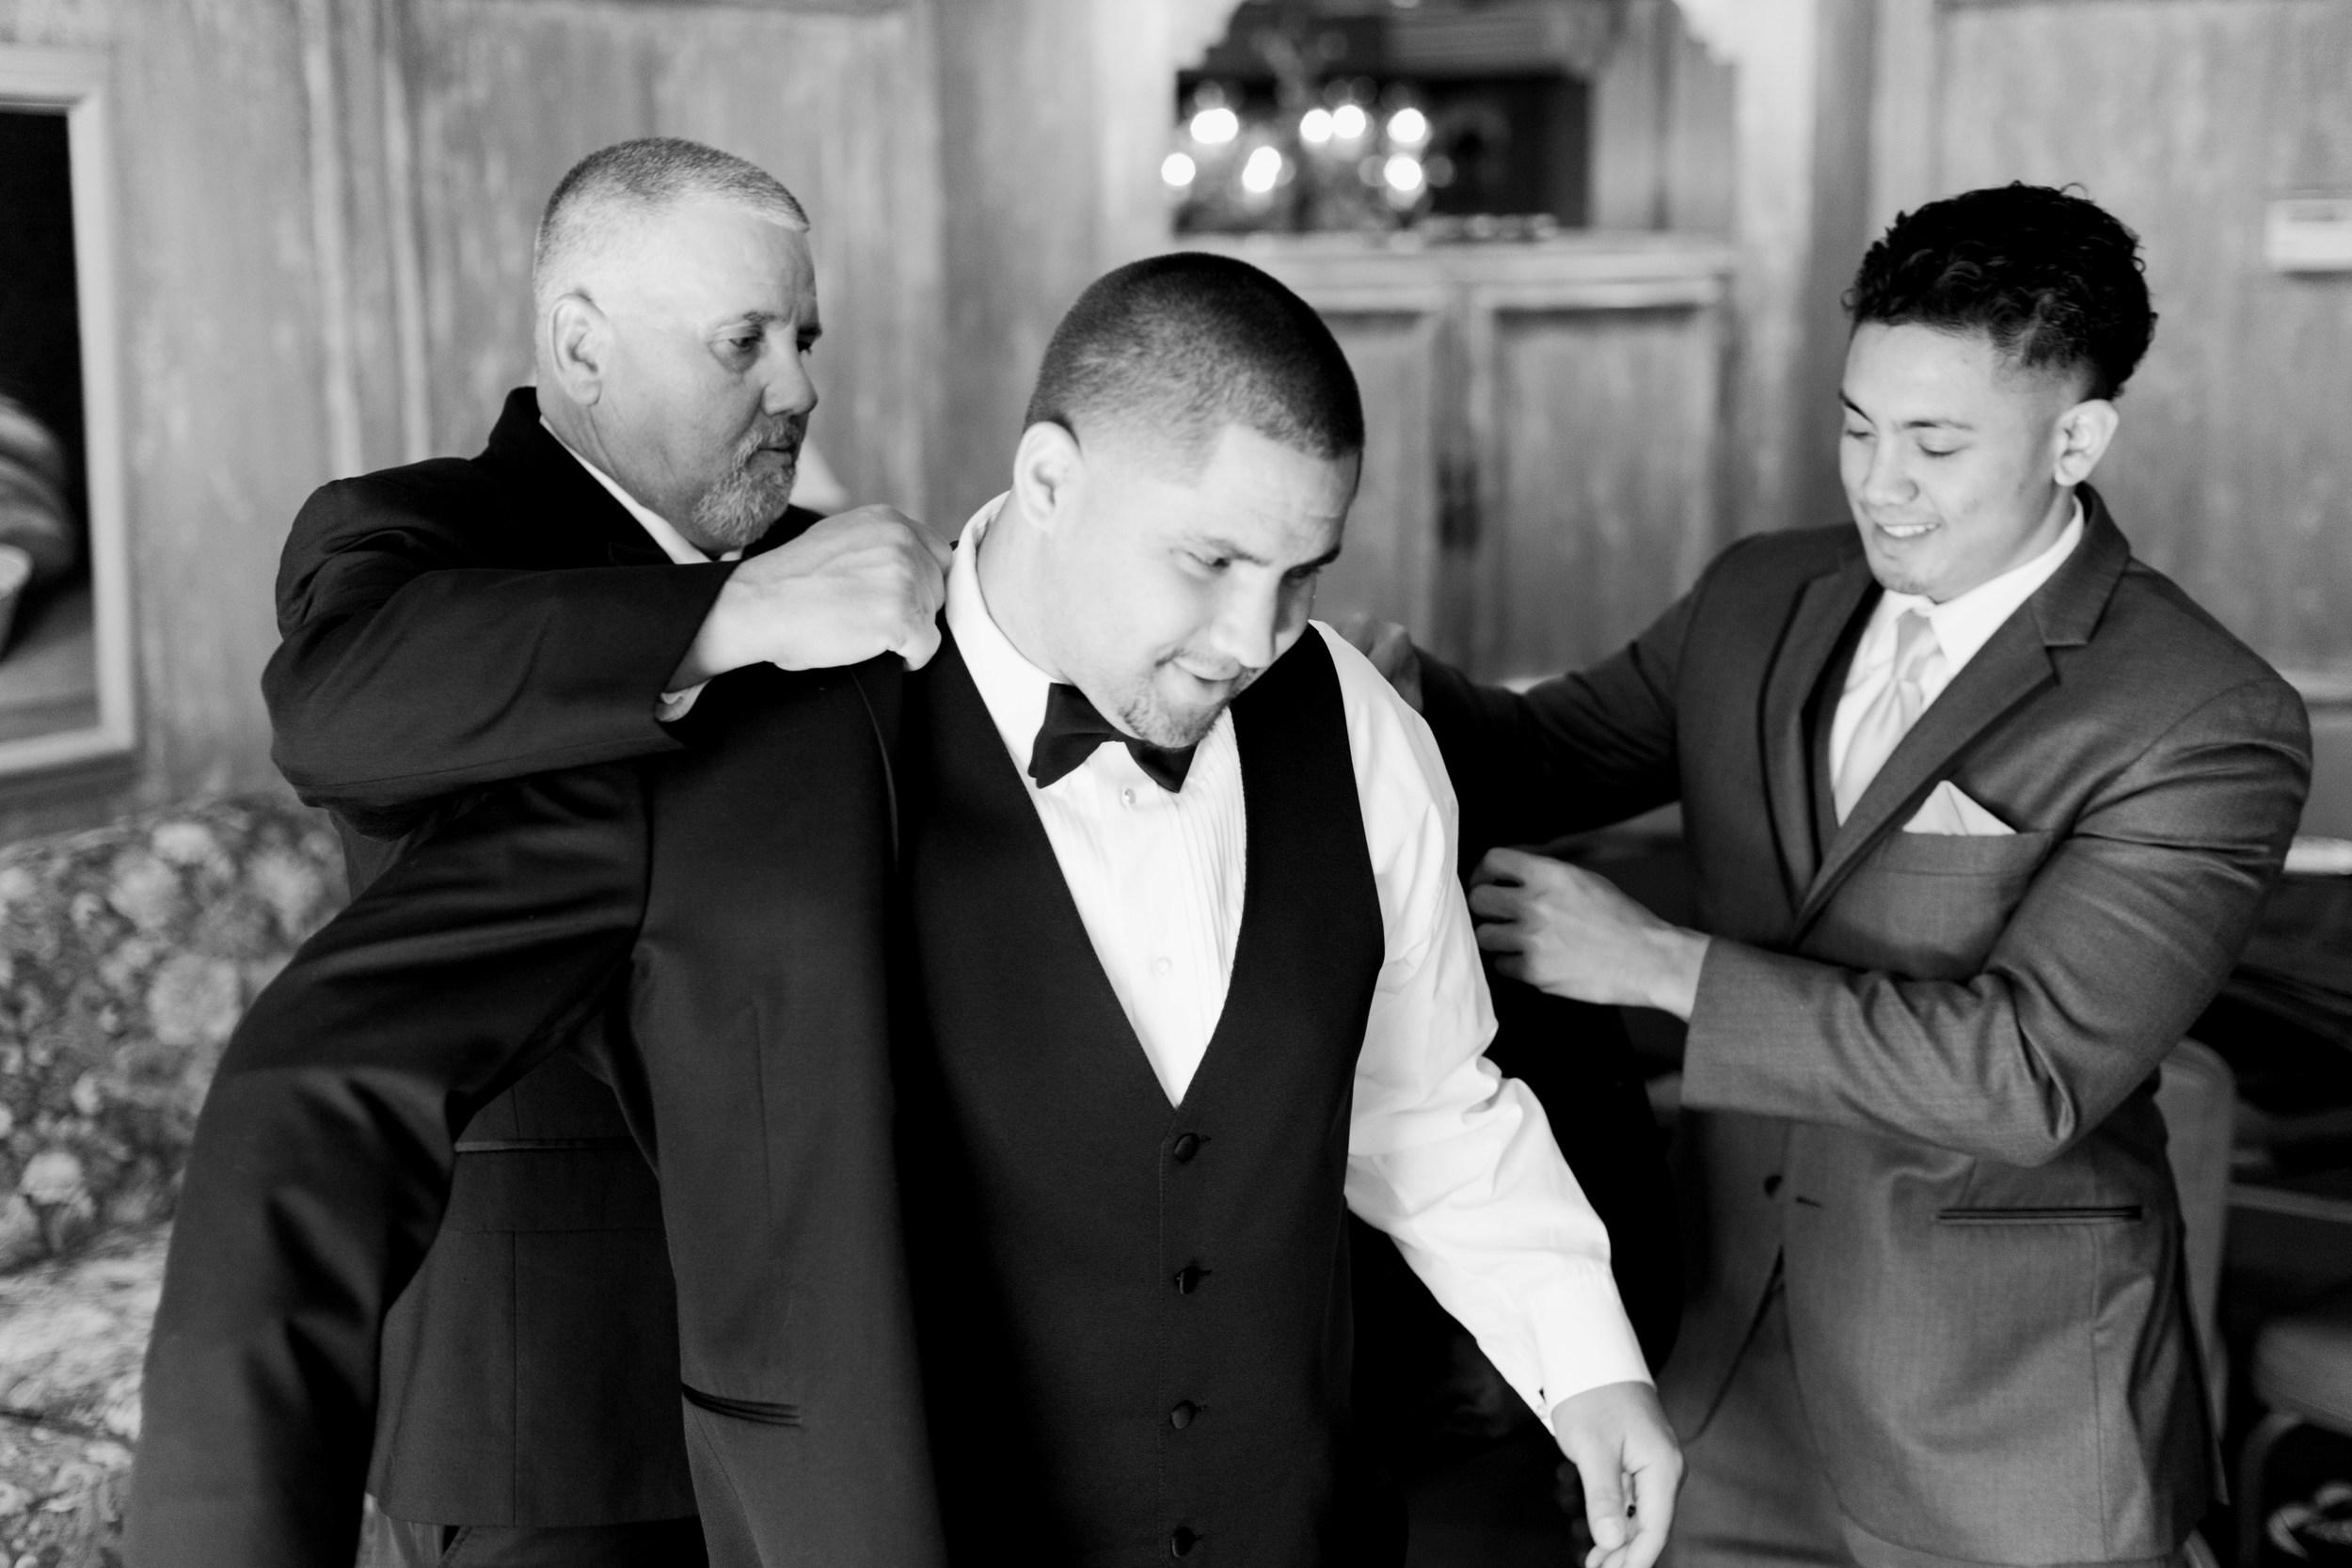 hawaiian-inspired-wedding-at-blackhawk-country-club-3940.jpg